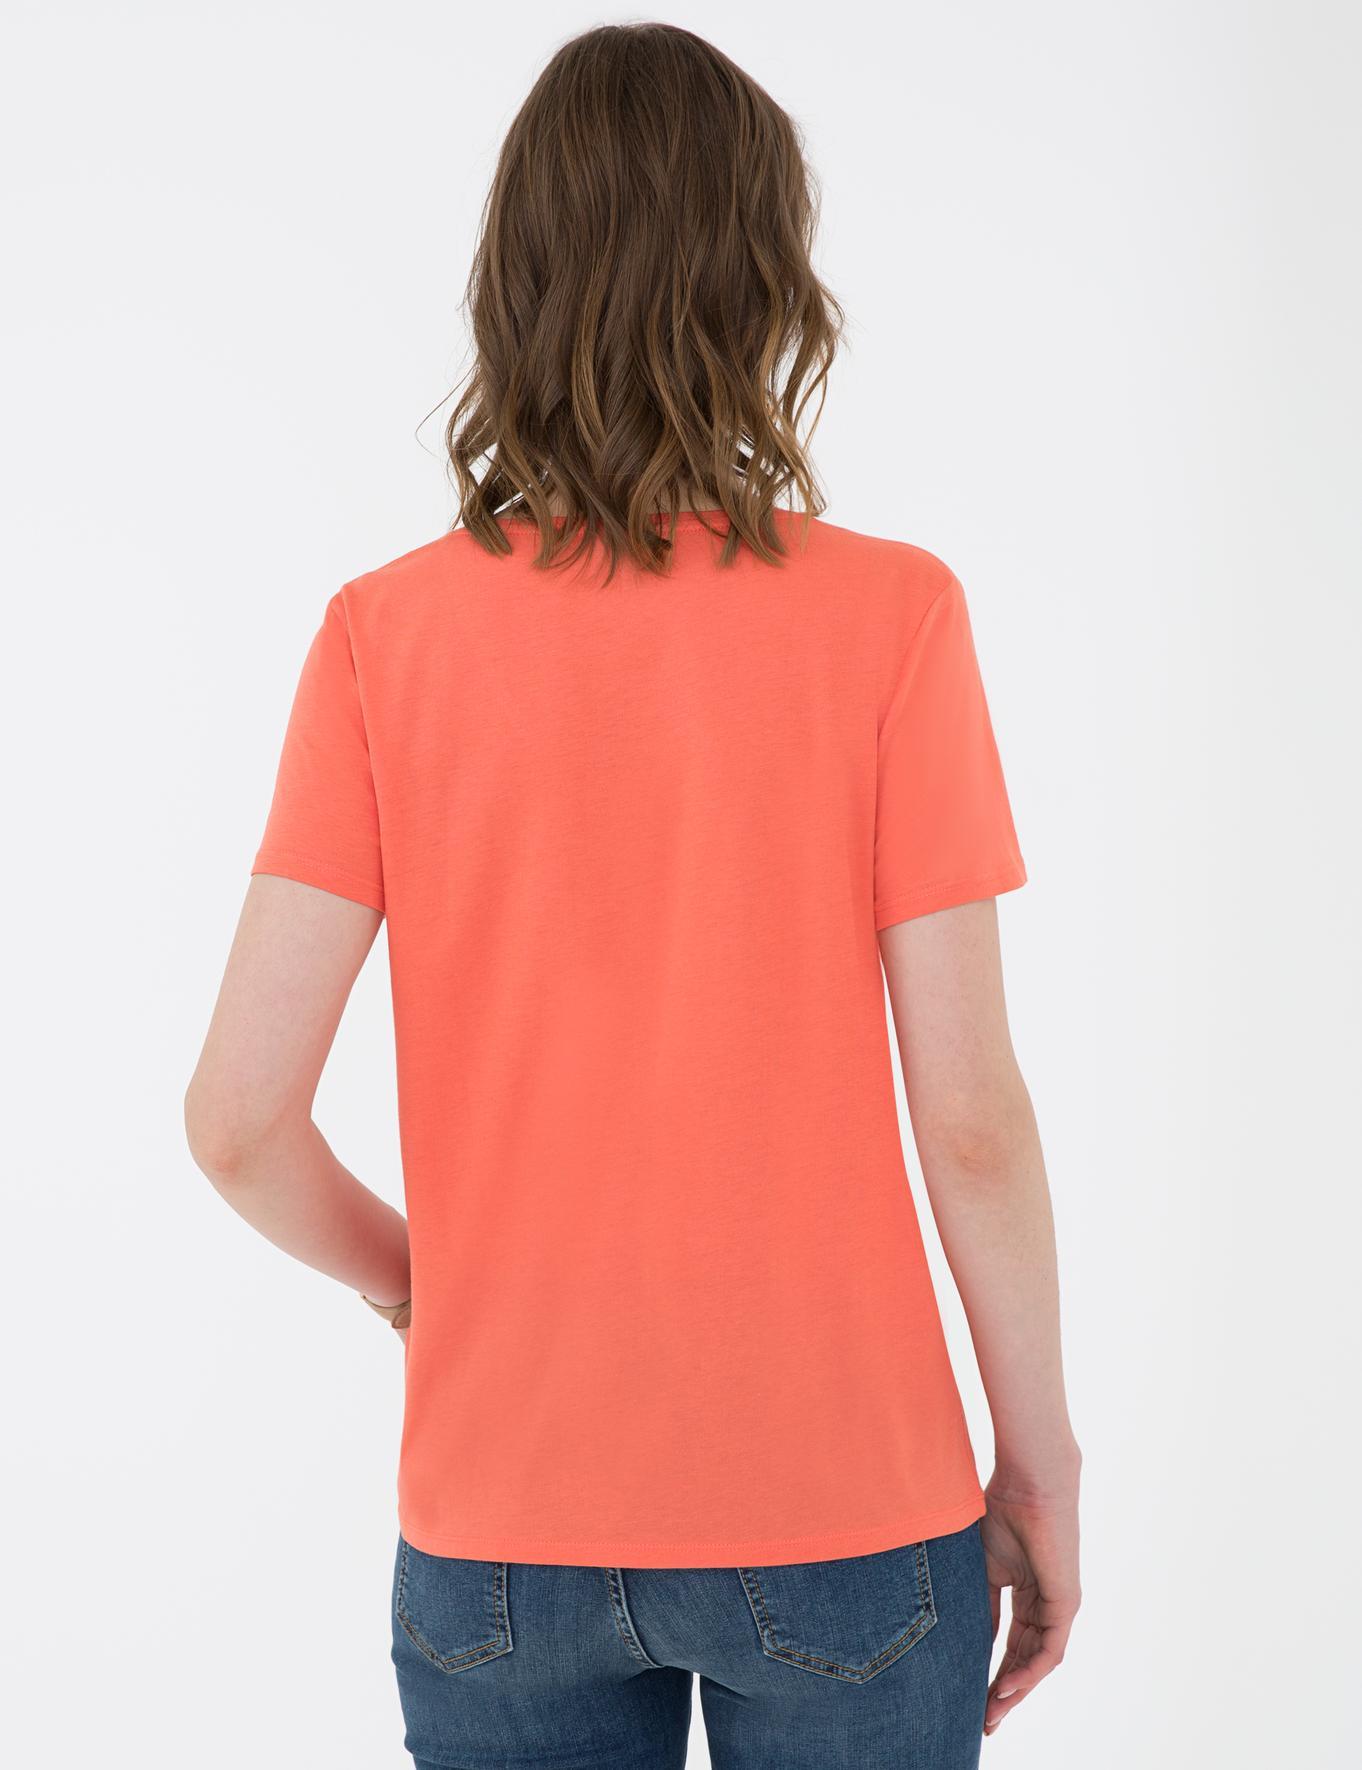 Nar Çiçeği Regular Fit V Yaka T-Shirt